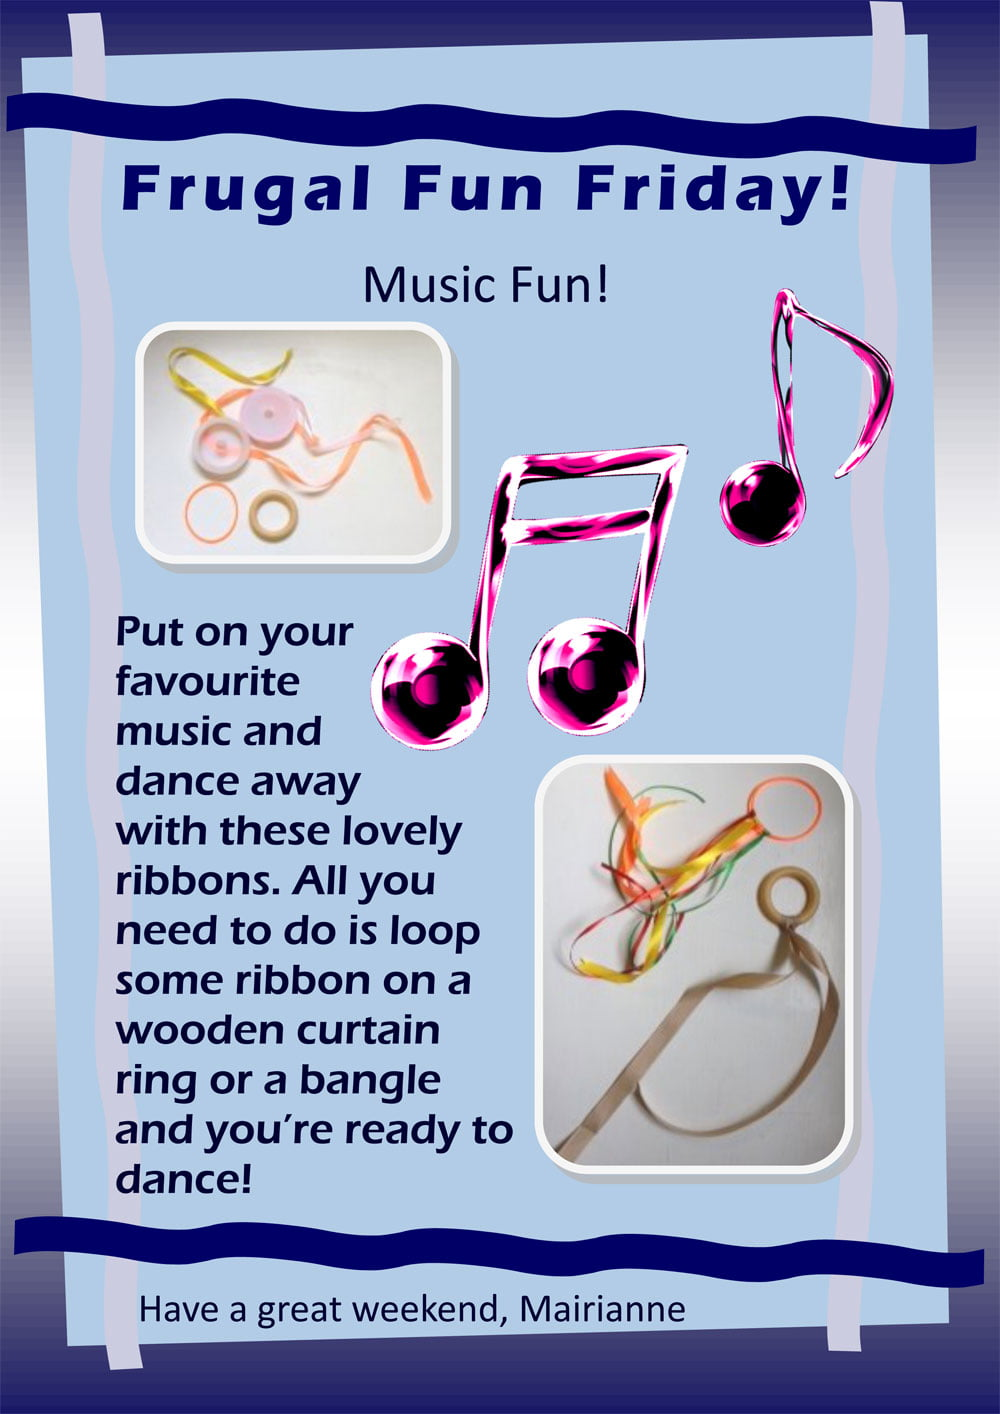 fff-music-fun